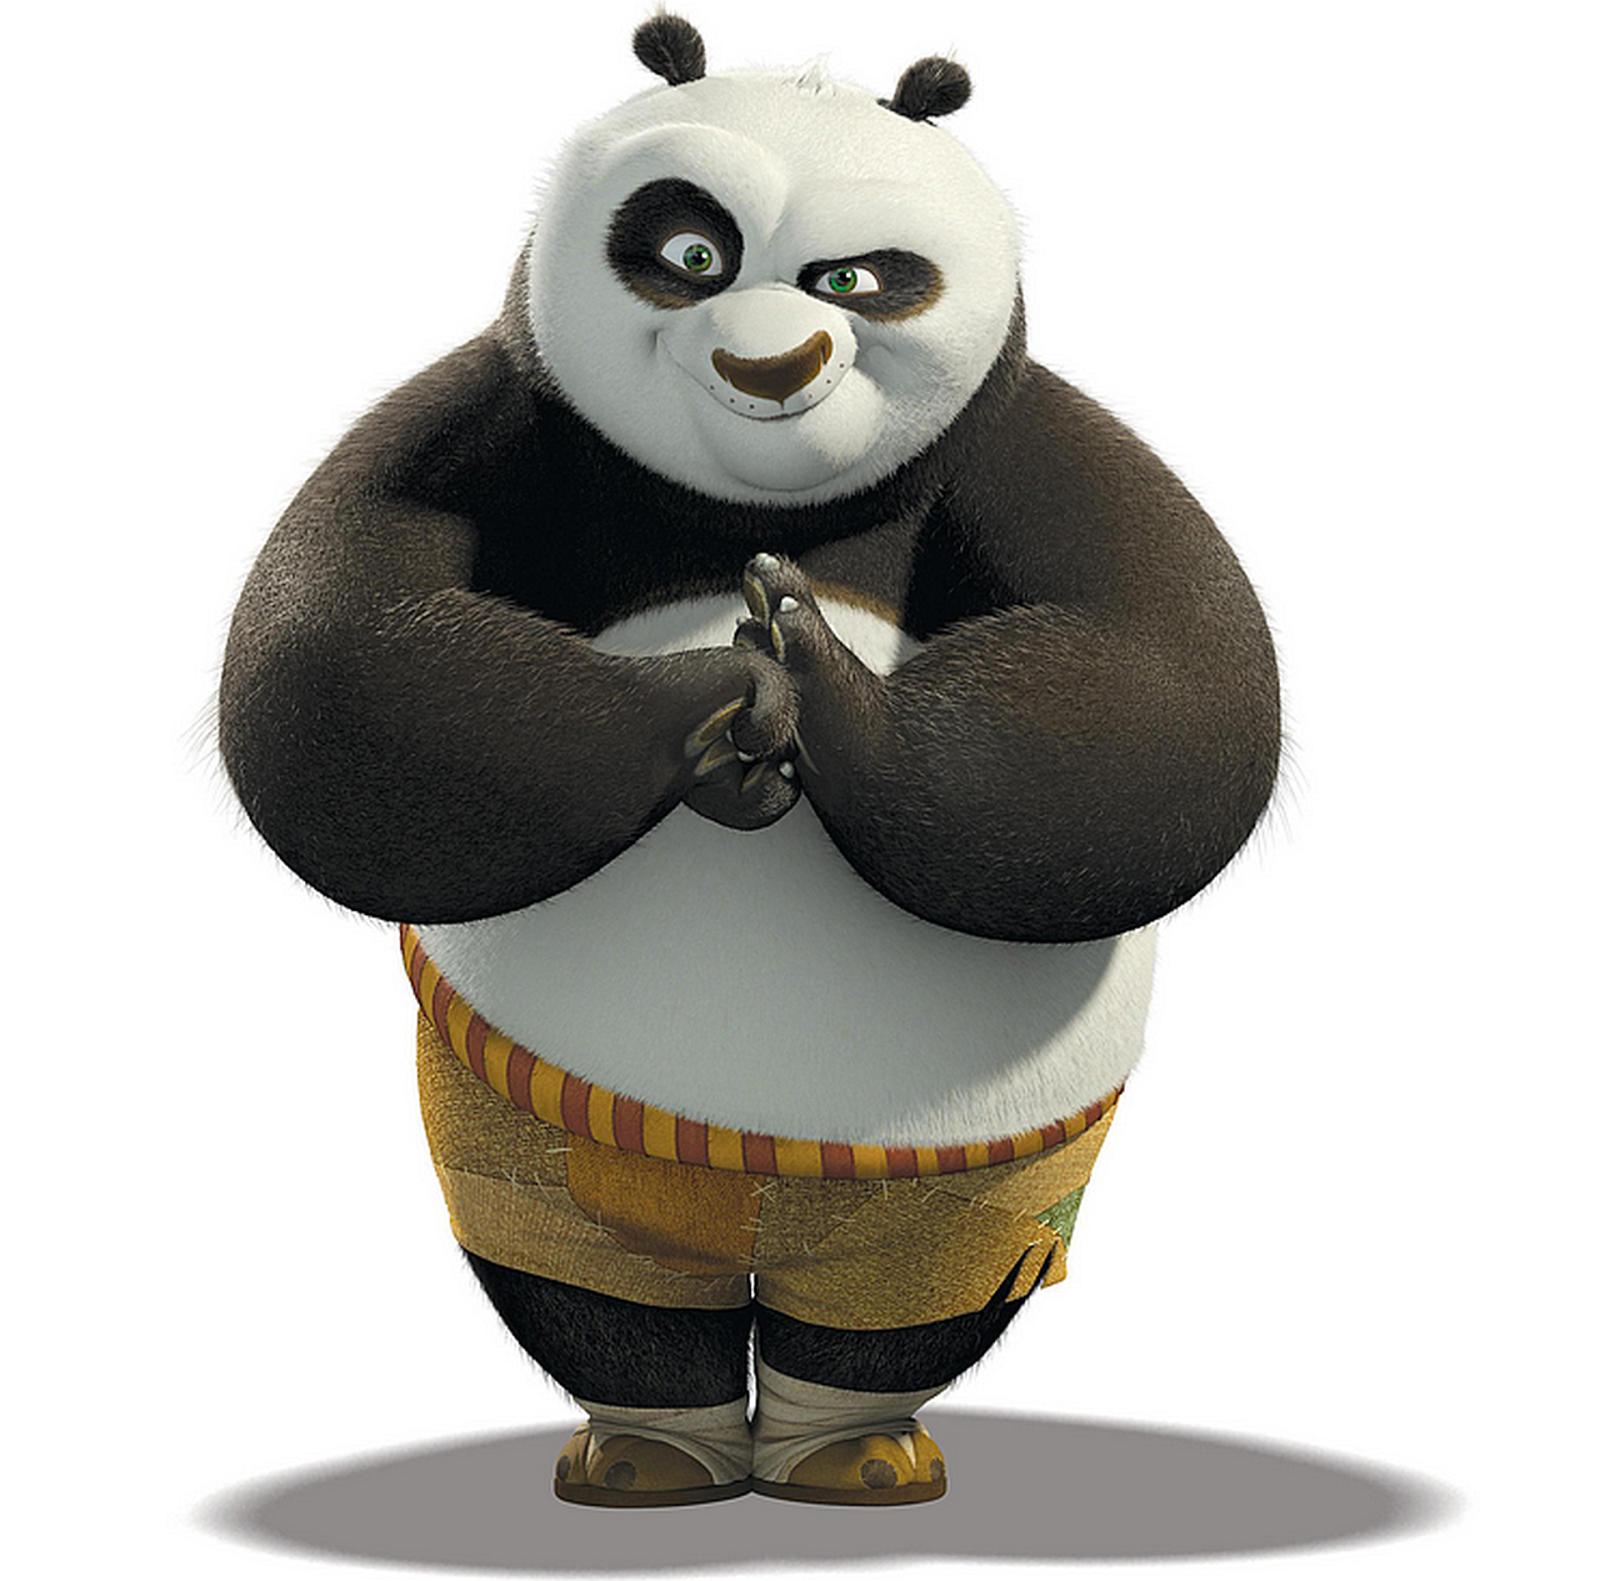 Kung Fu Panda 3 Characters ~ NewKungFuPanda3